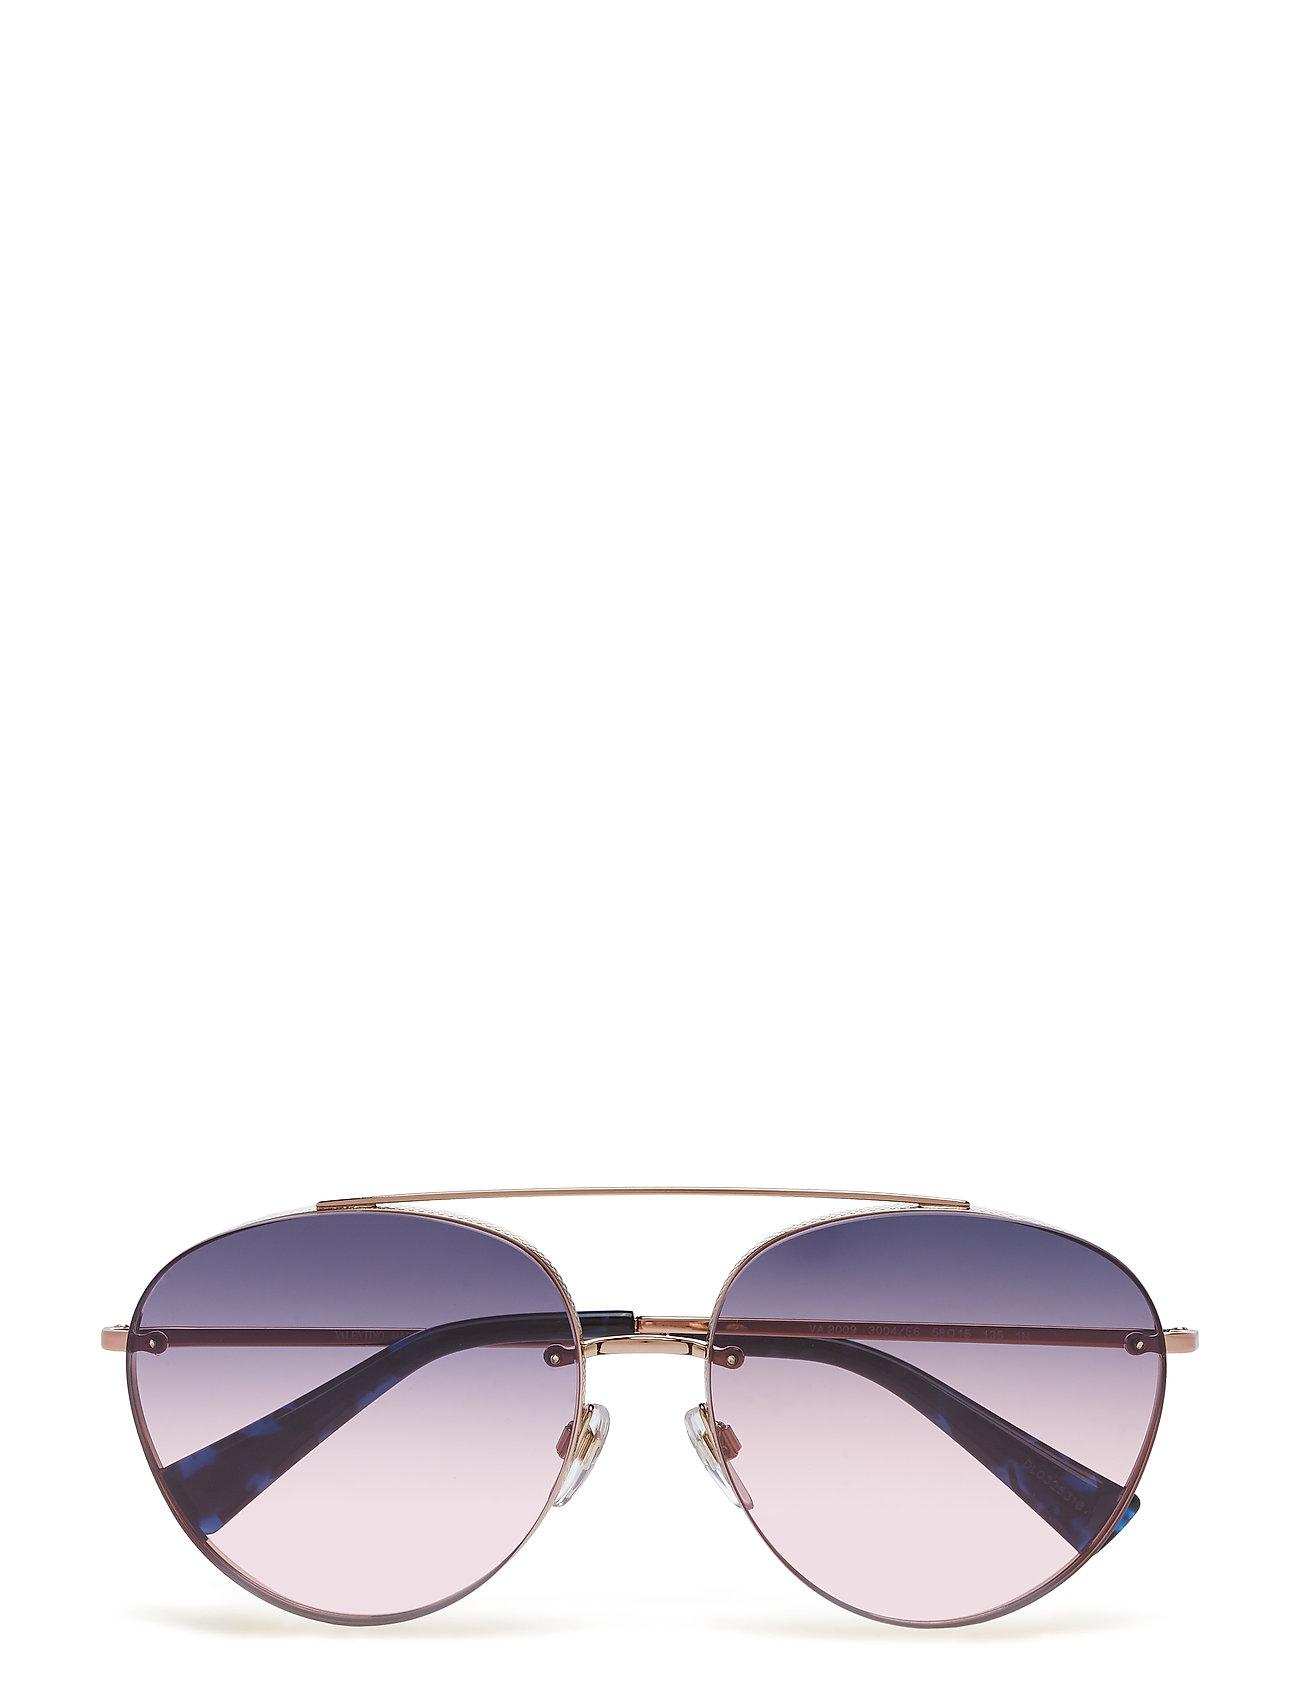 Individual - Valentino Sunglasses